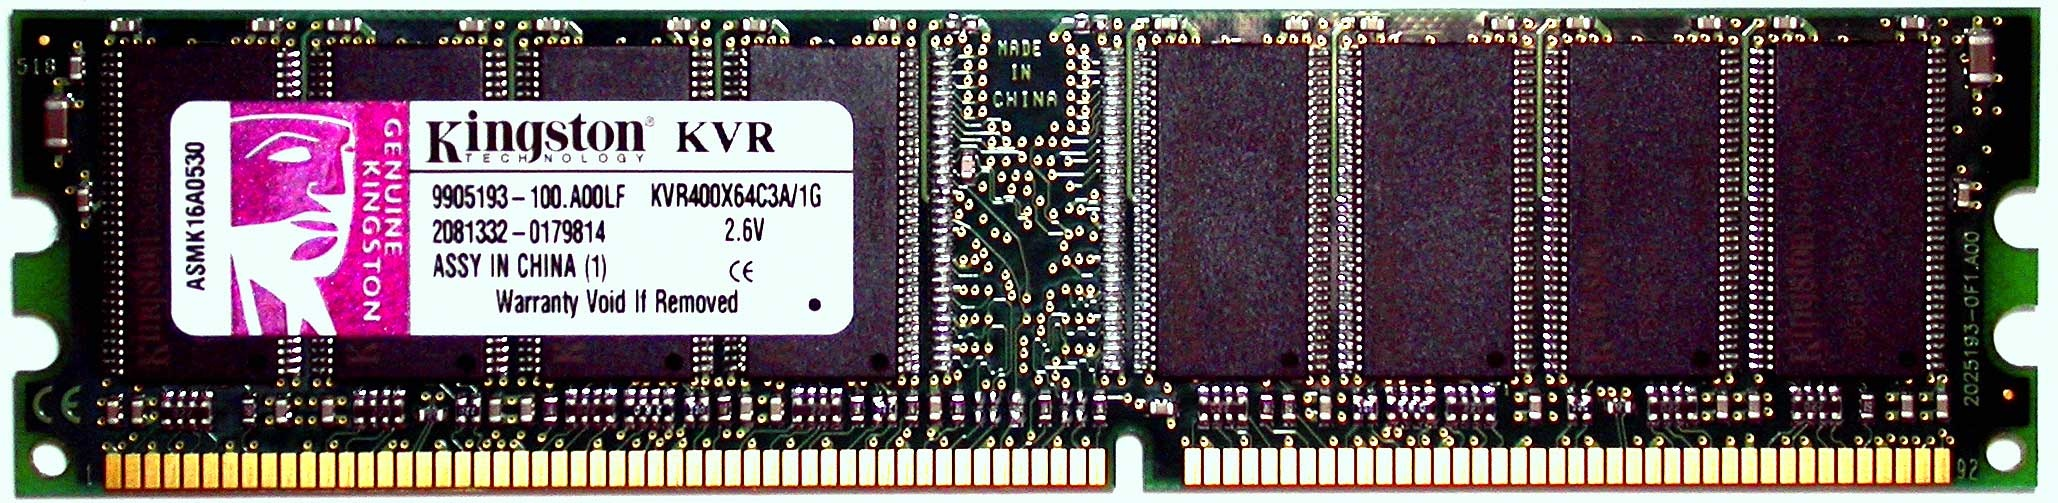 Kingston KVR400X64C3A 1G 20051111